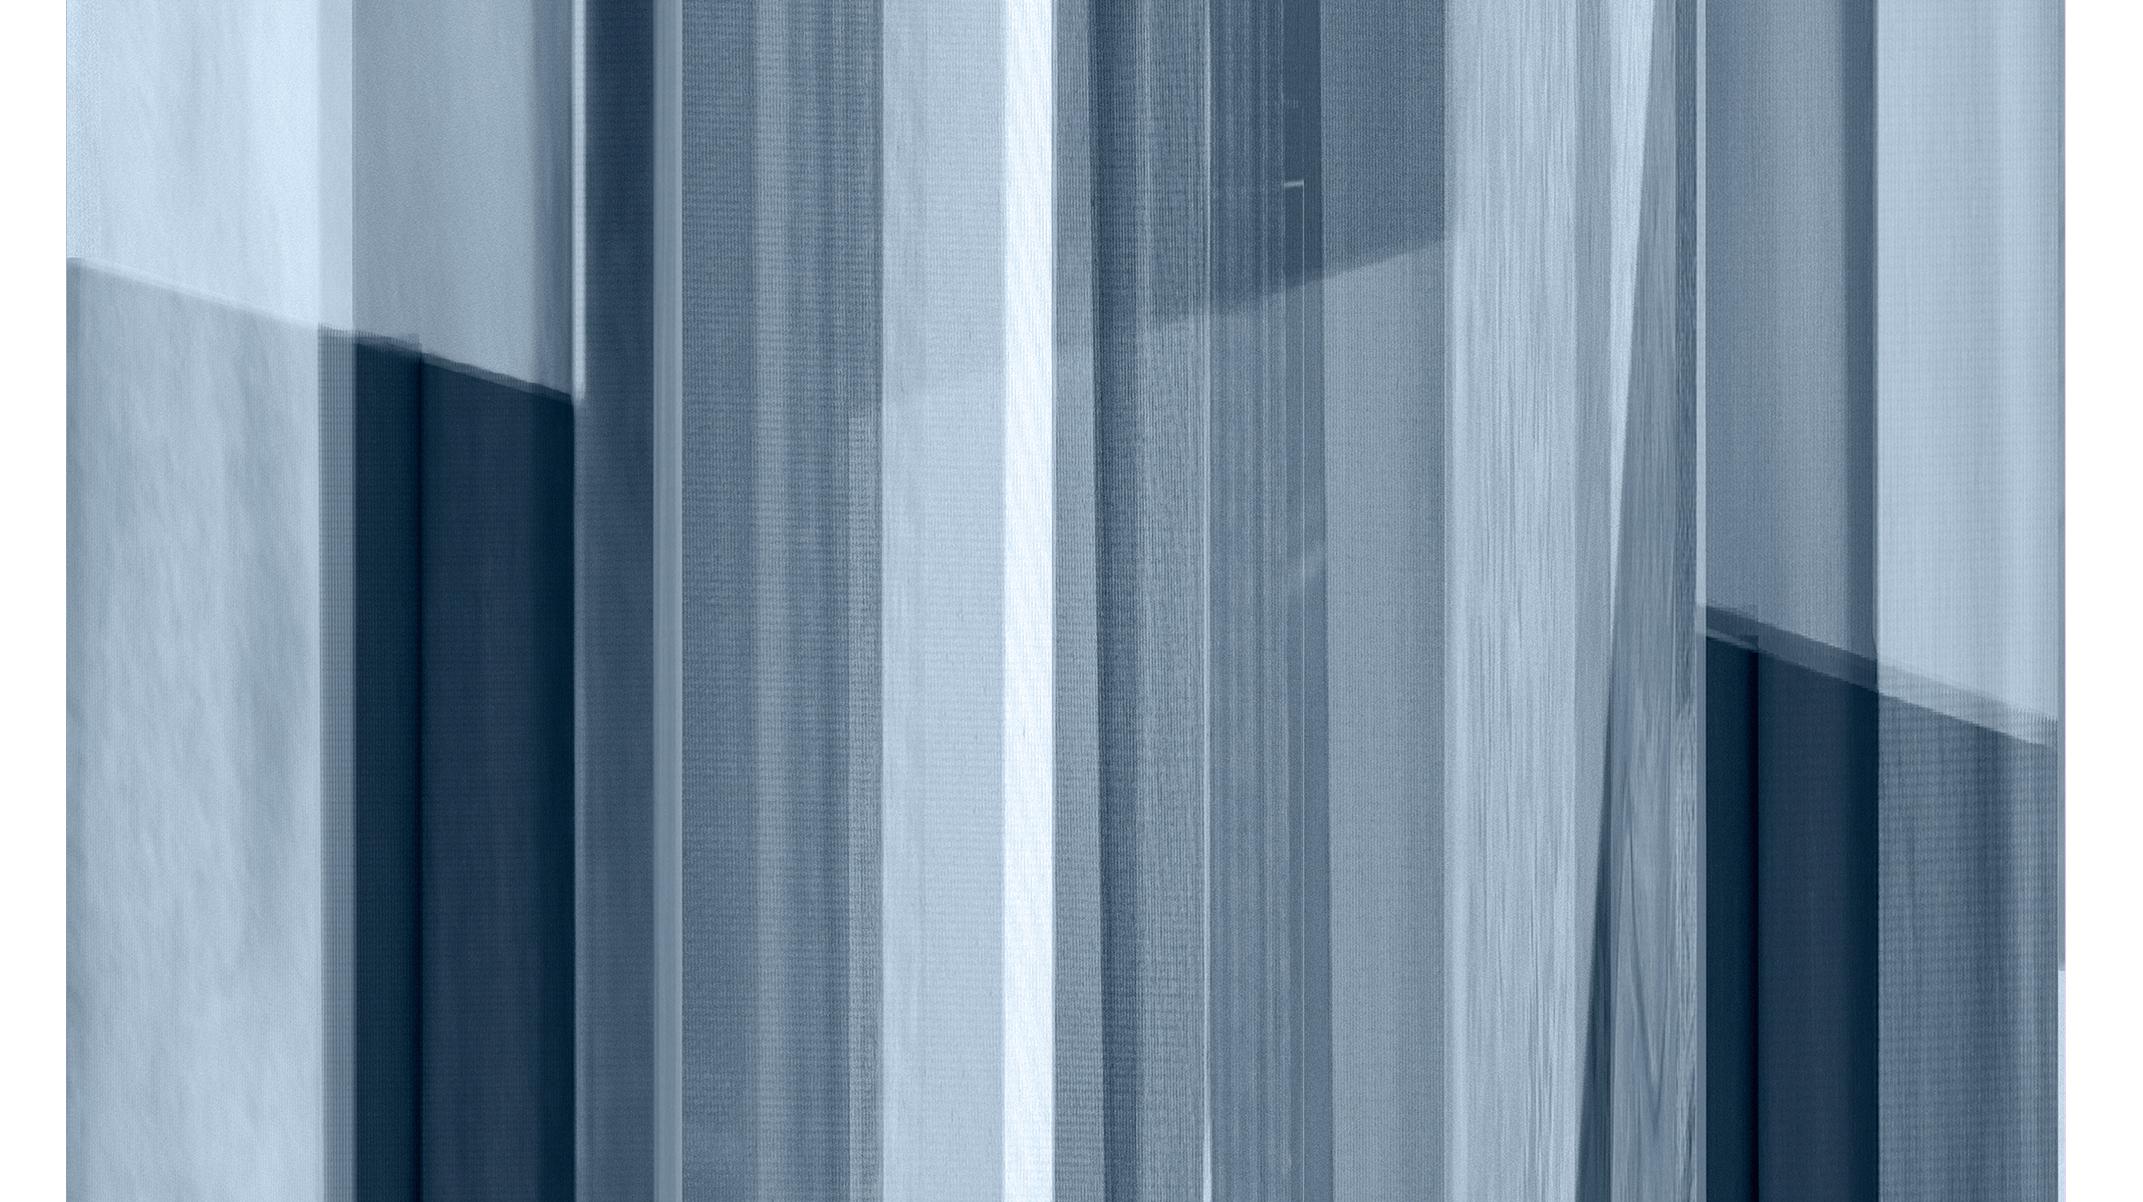 SS_02_Detail01.jpg